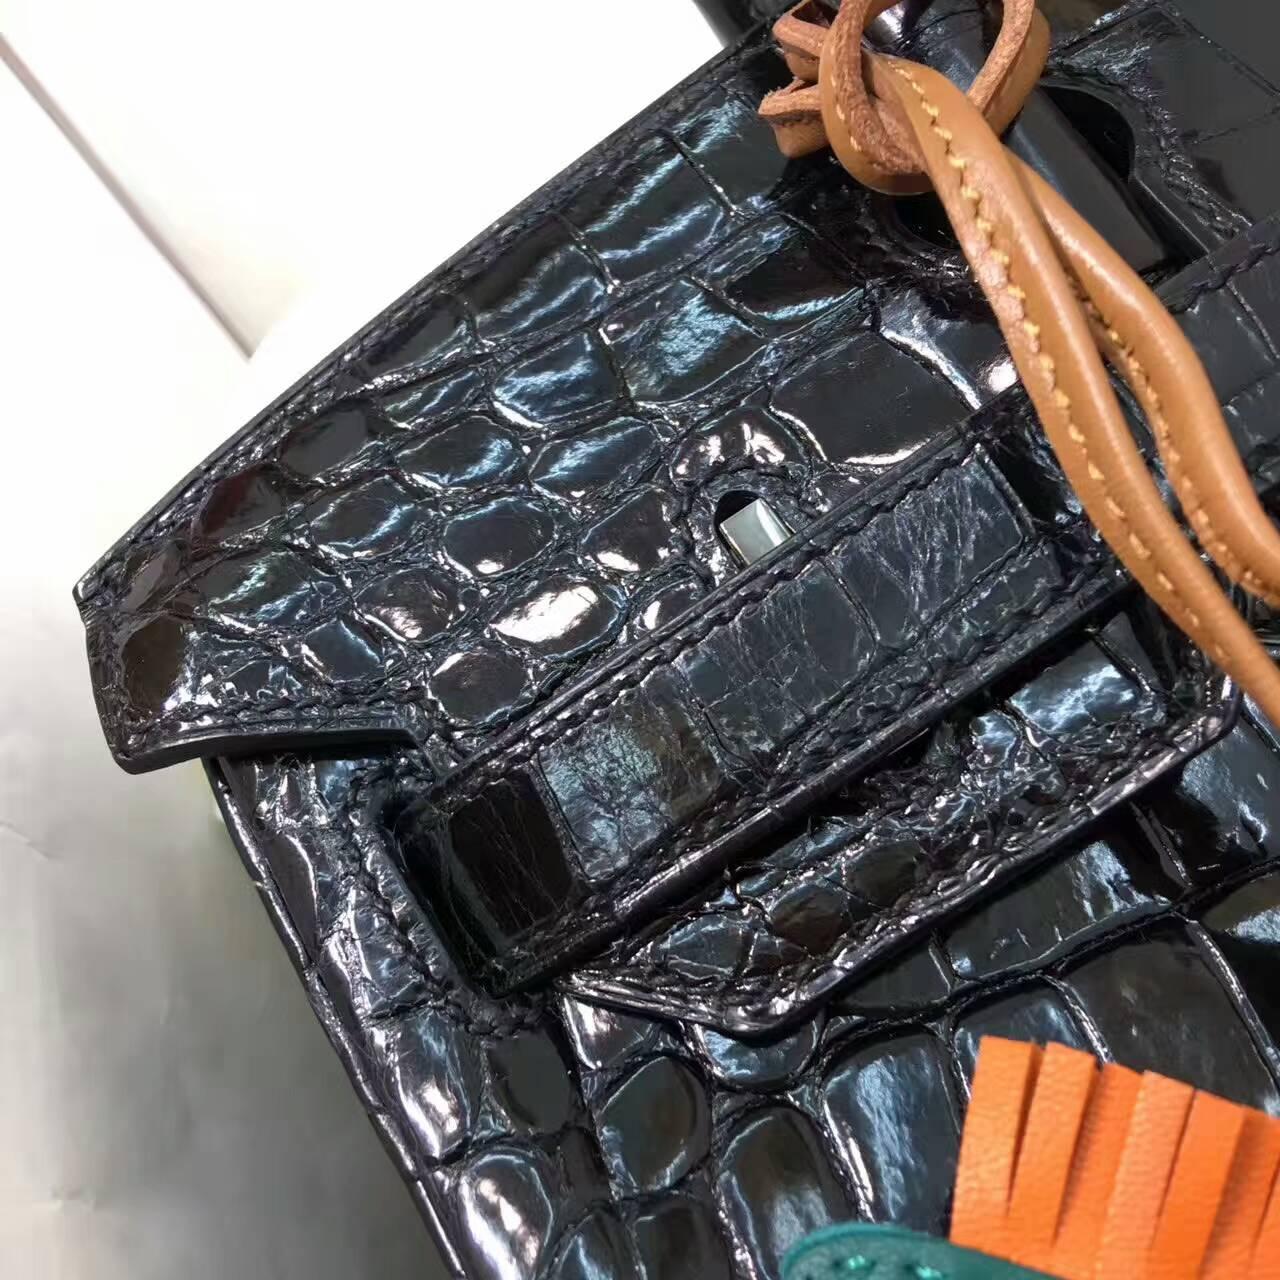 Birkin铂金包 Hermes包包 30cm Shiny Niloticus Crocodile 亮面两点非洲原产尼罗鳄 89 Nior 黑色 黑扣